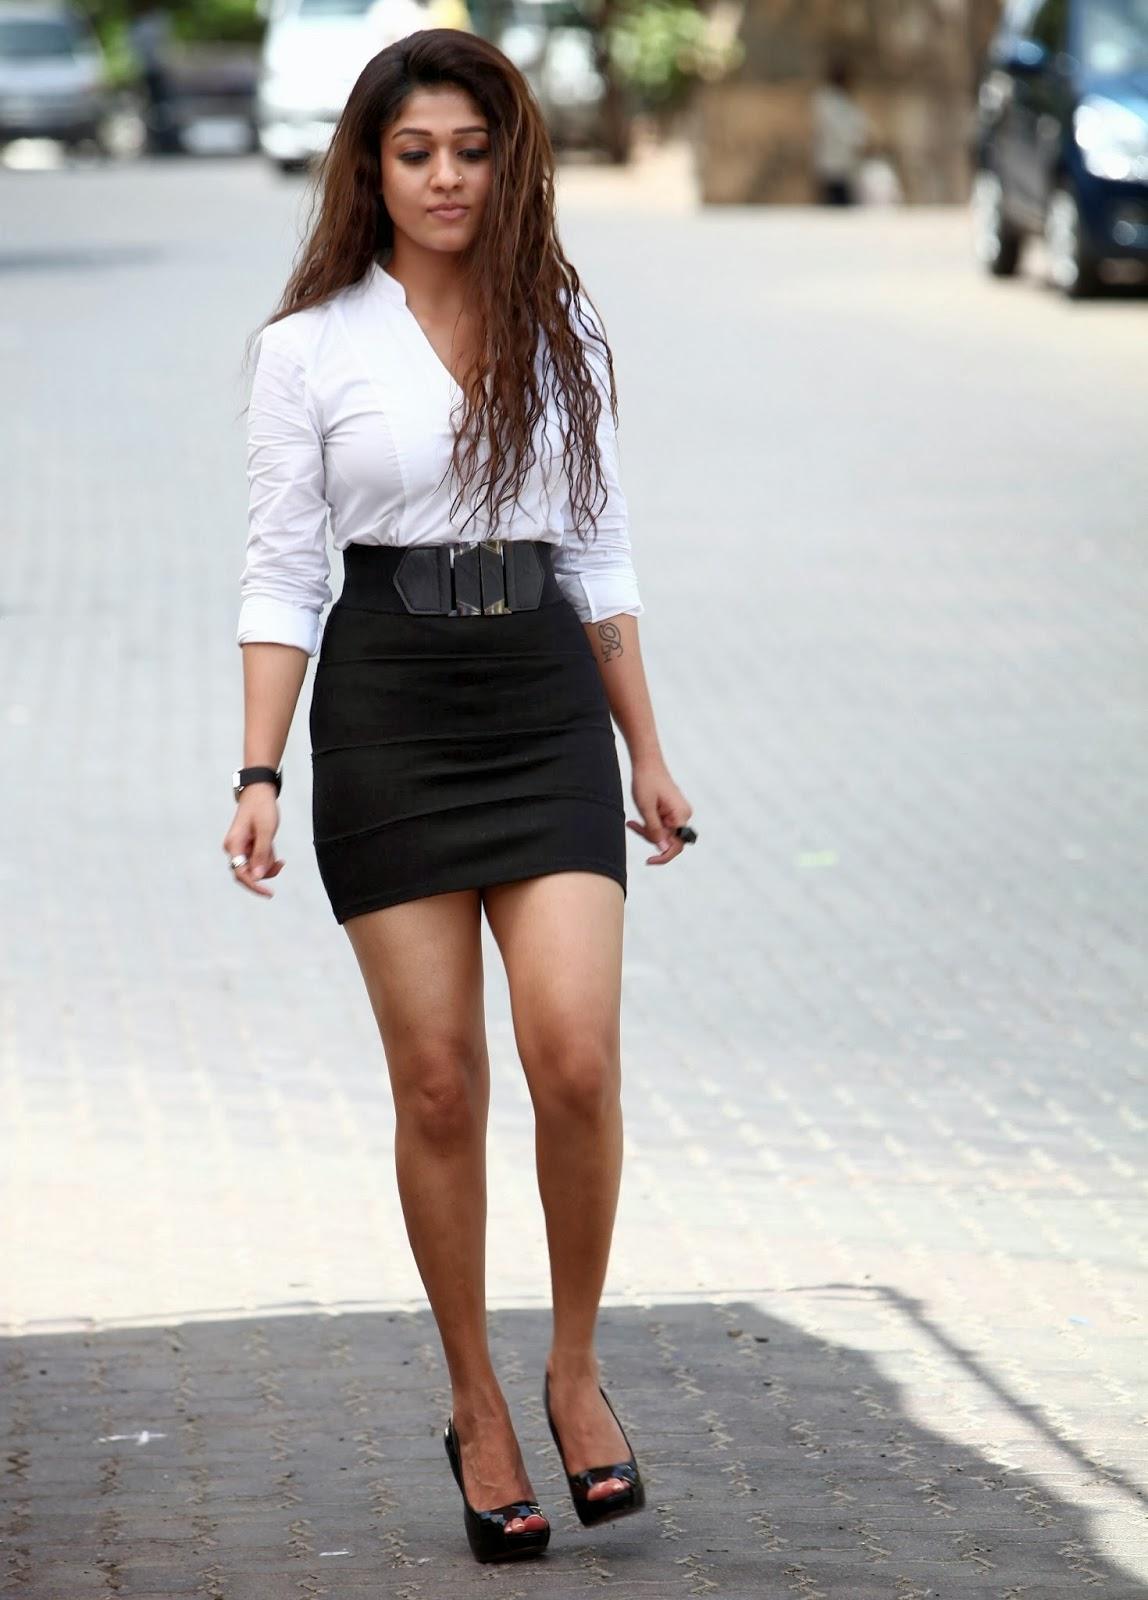 Innovative  Women In Short Skirts Displaying 13 Images For Women In Short Skirts